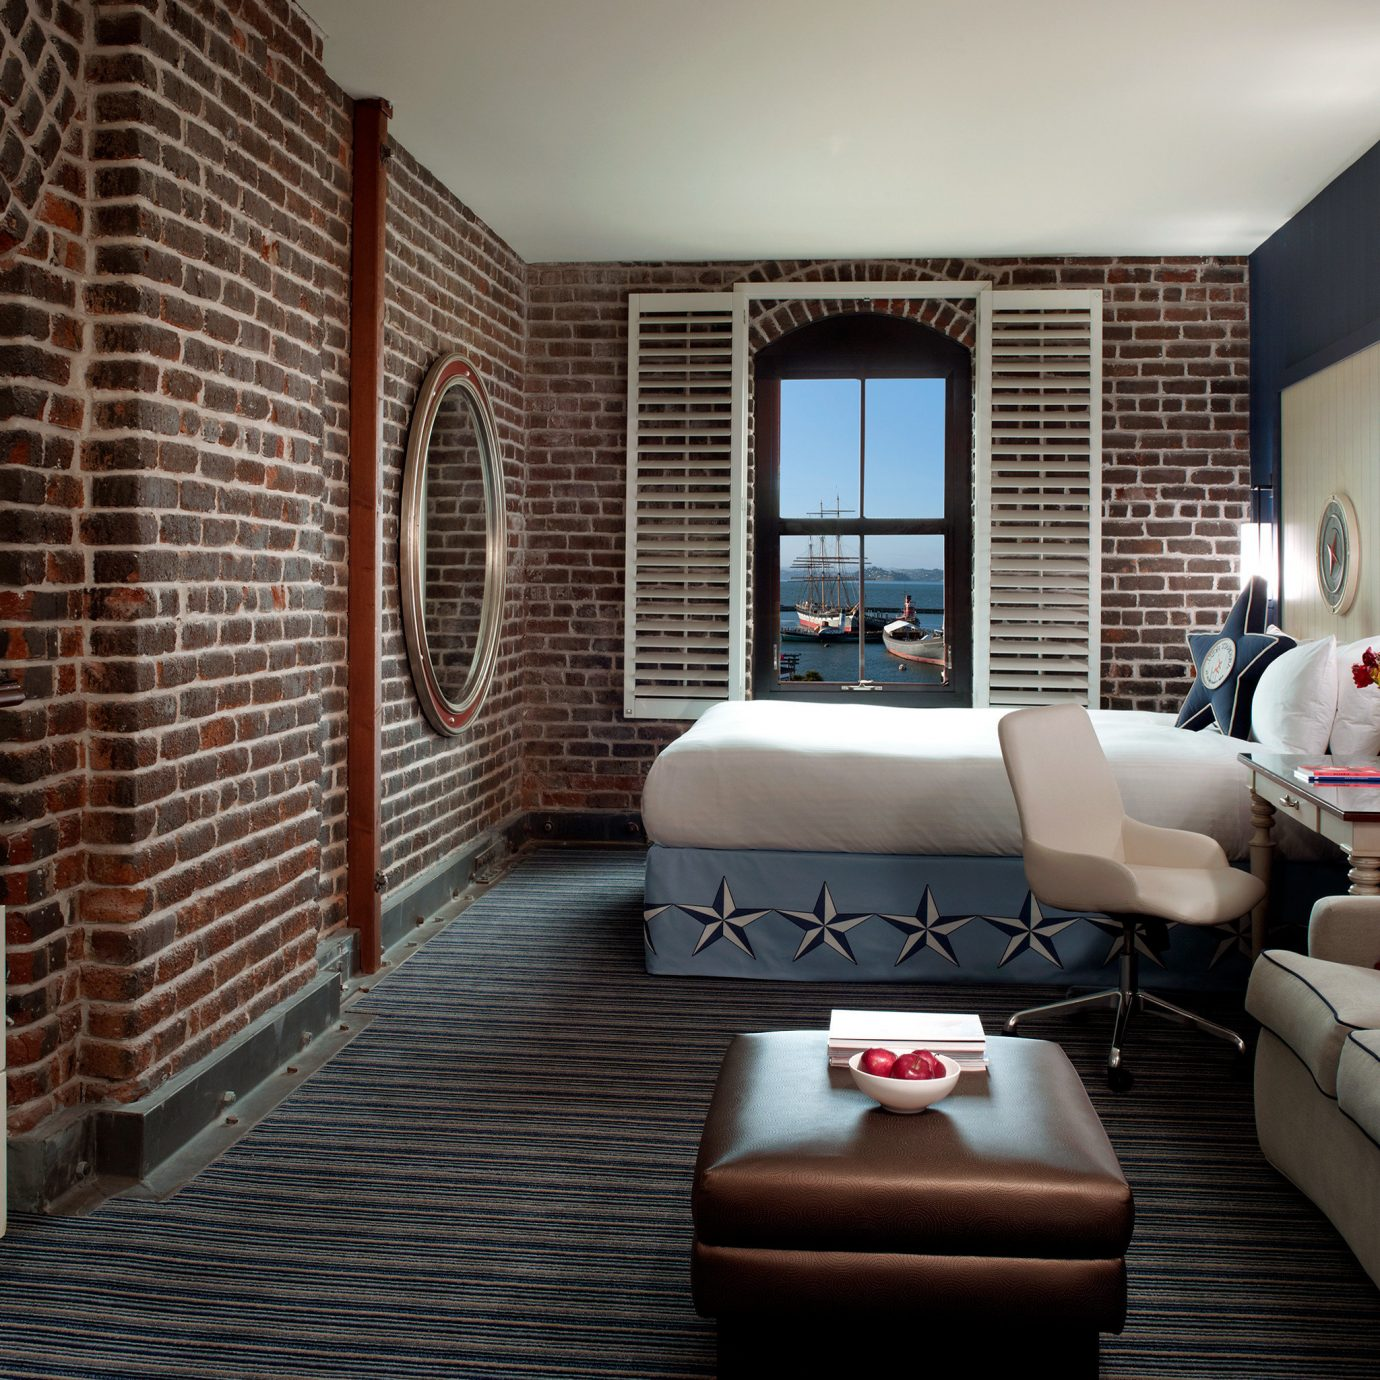 Bedroom City Historic Hotels Trip Ideas sofa living room property condominium home Suite Lobby